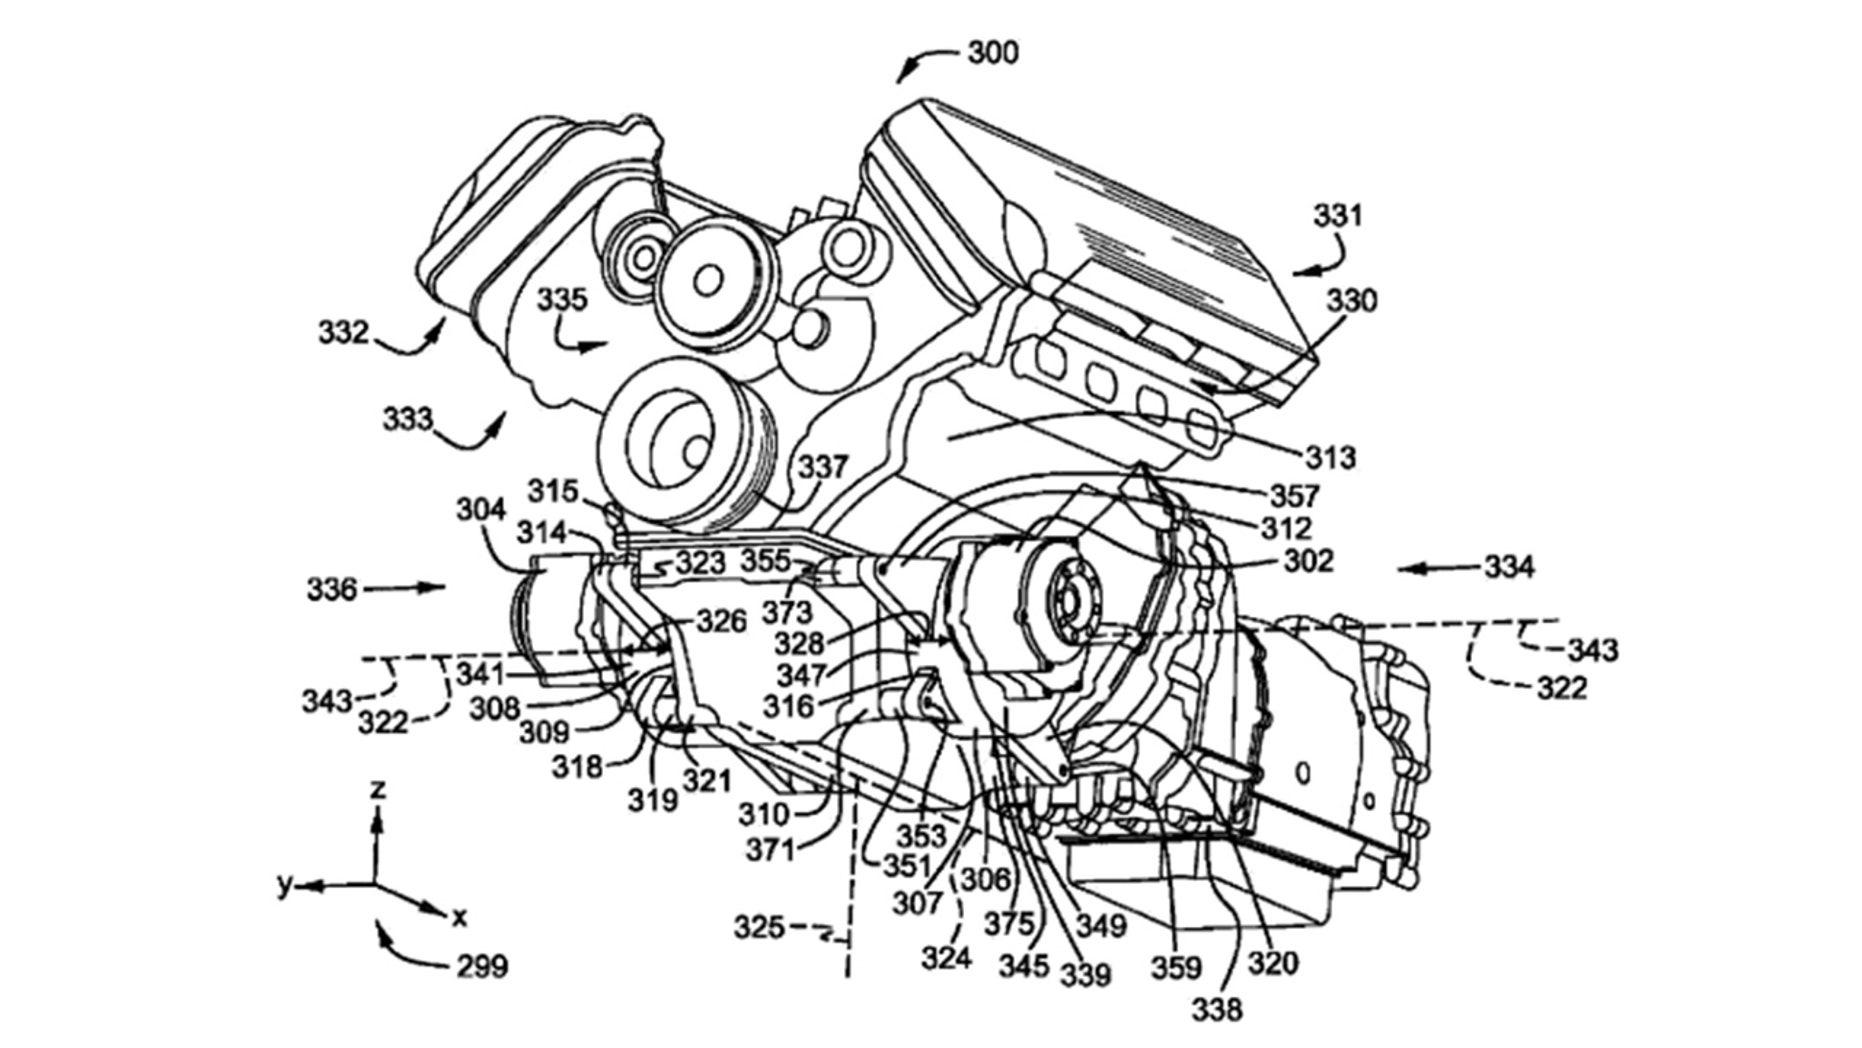 Unique all-wheel-drive hybrid V8 powertrain revealed in